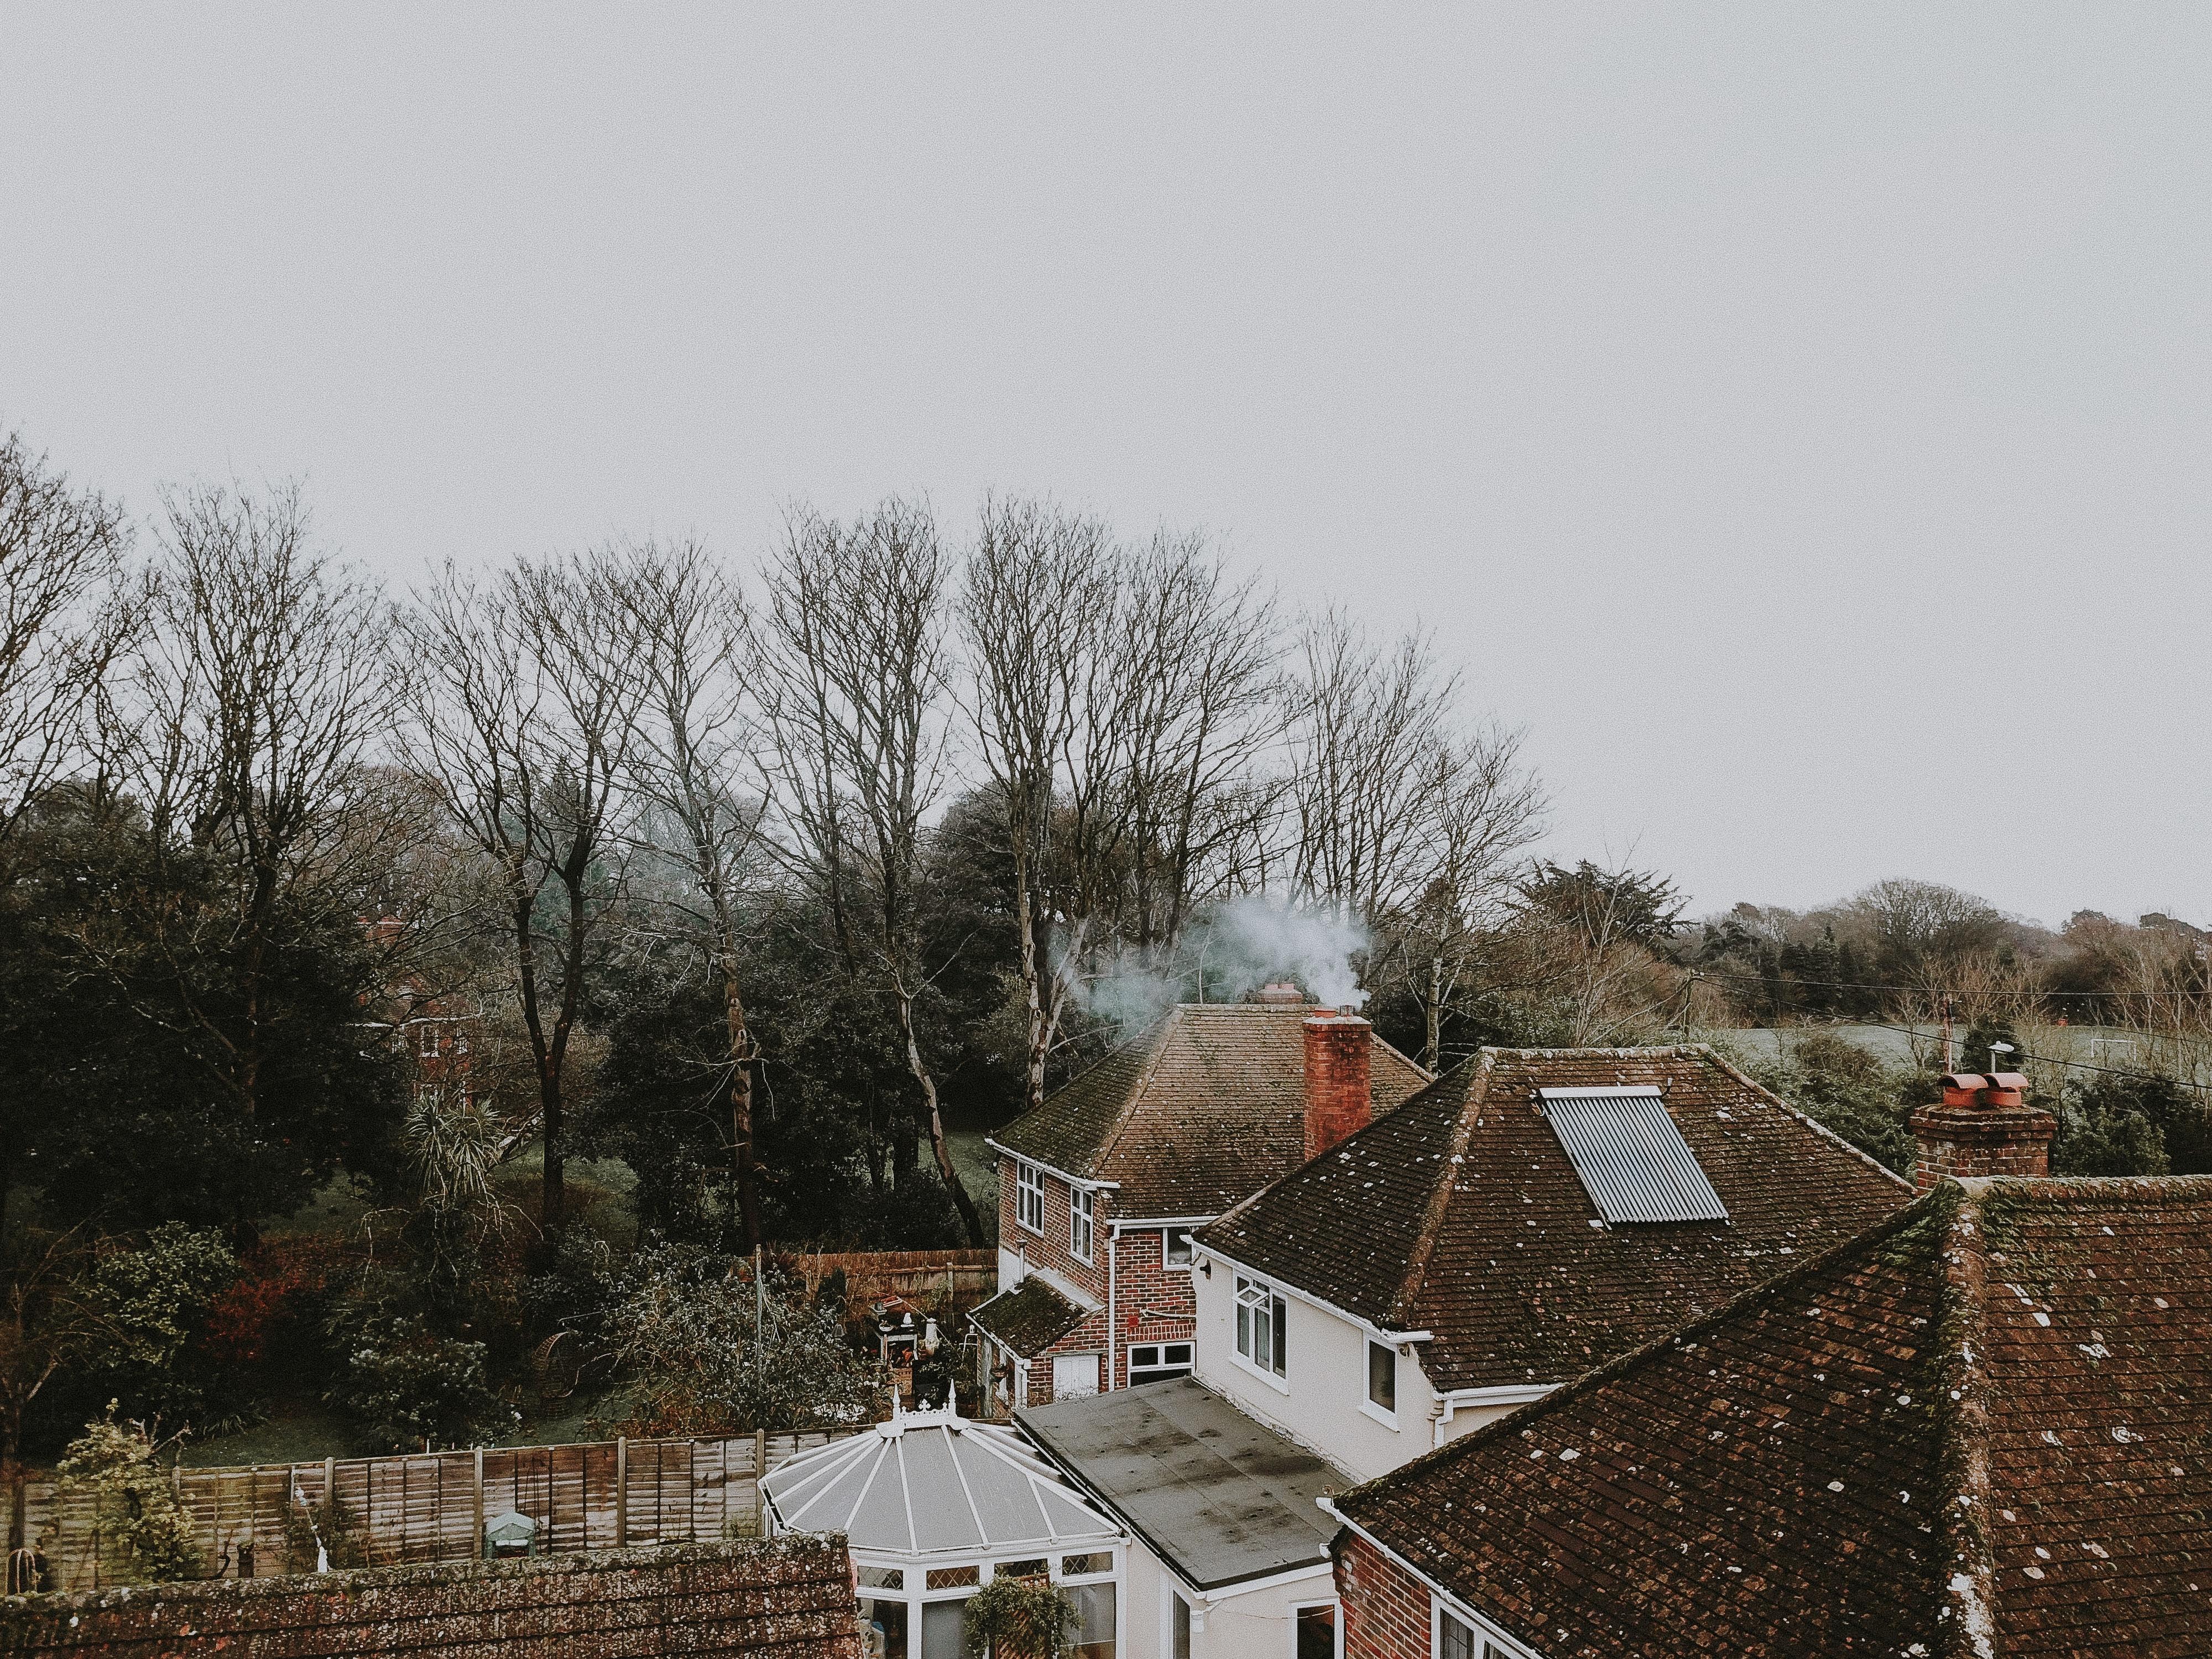 high angle view of house